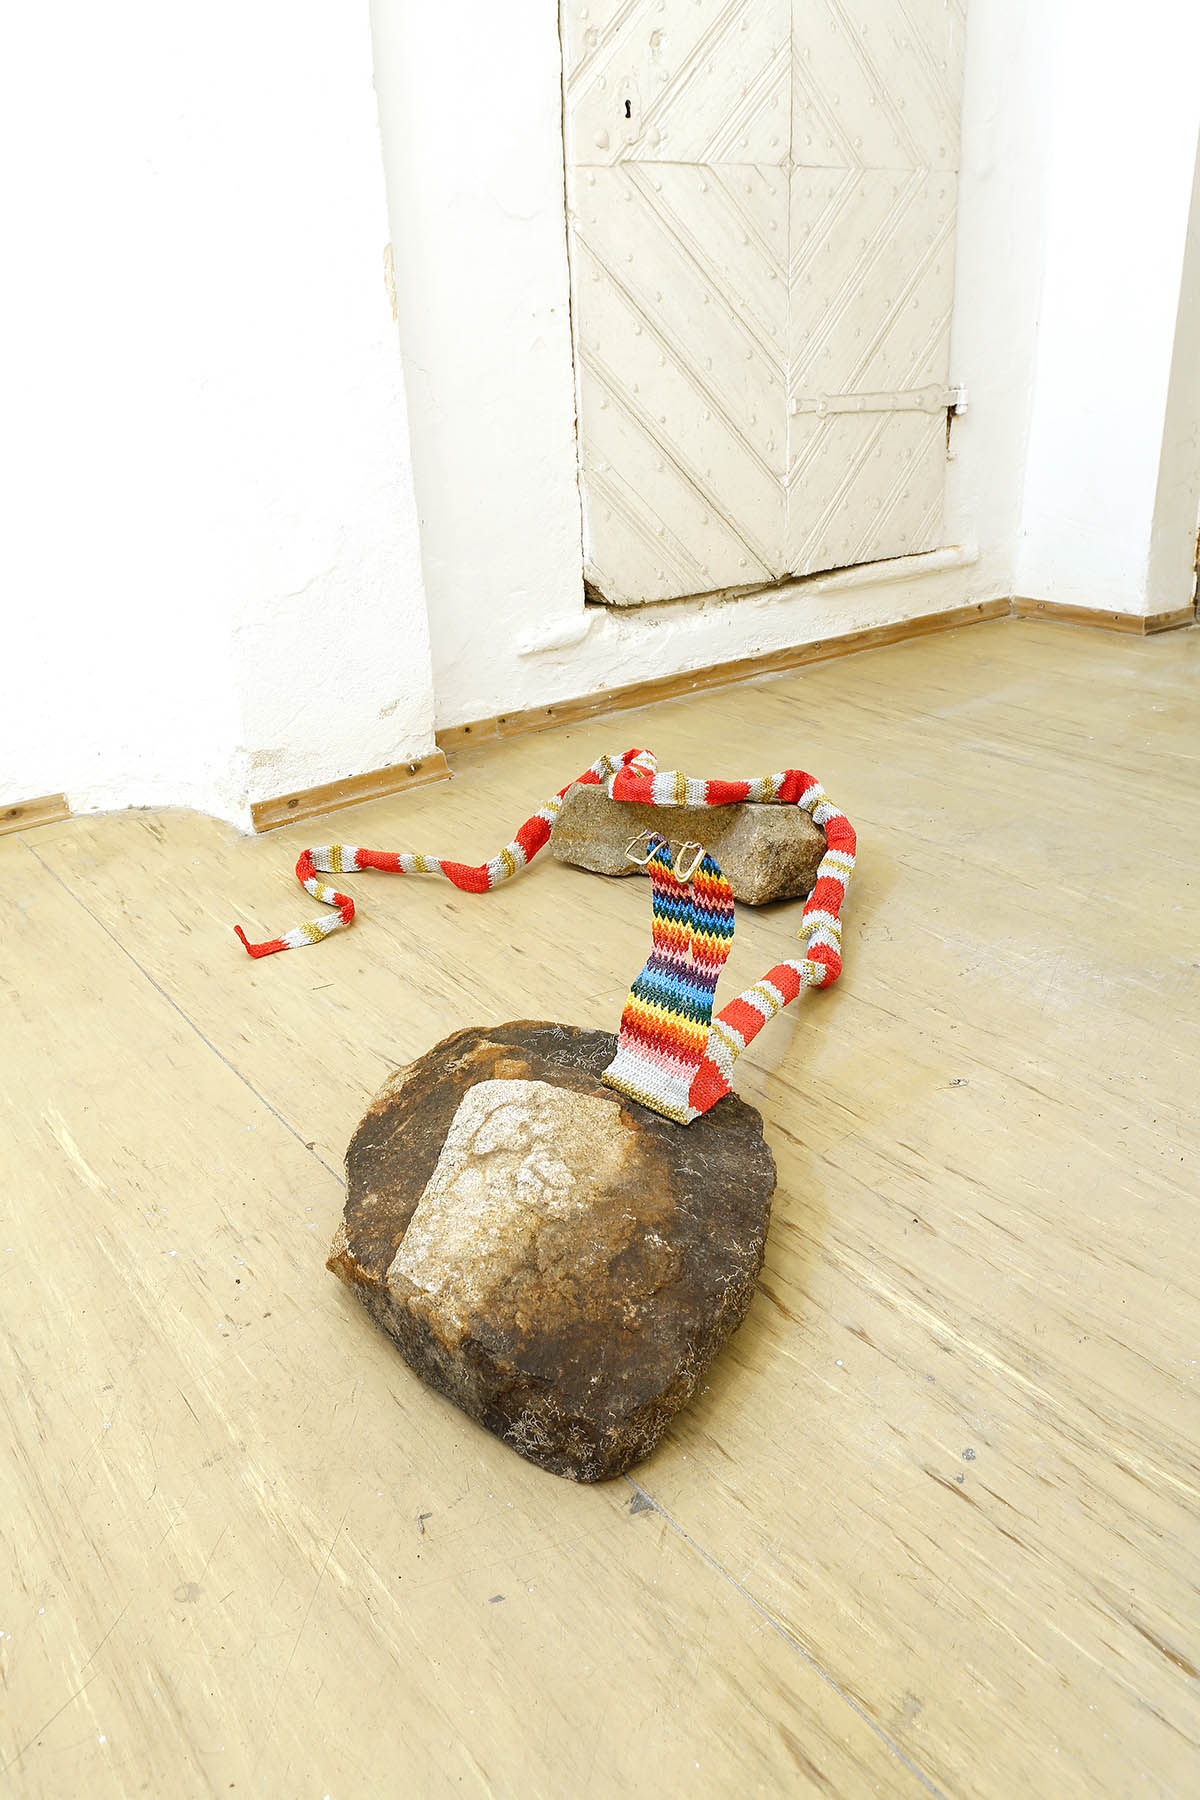 nilbar gueres, artist, snake, installation, contemporary art